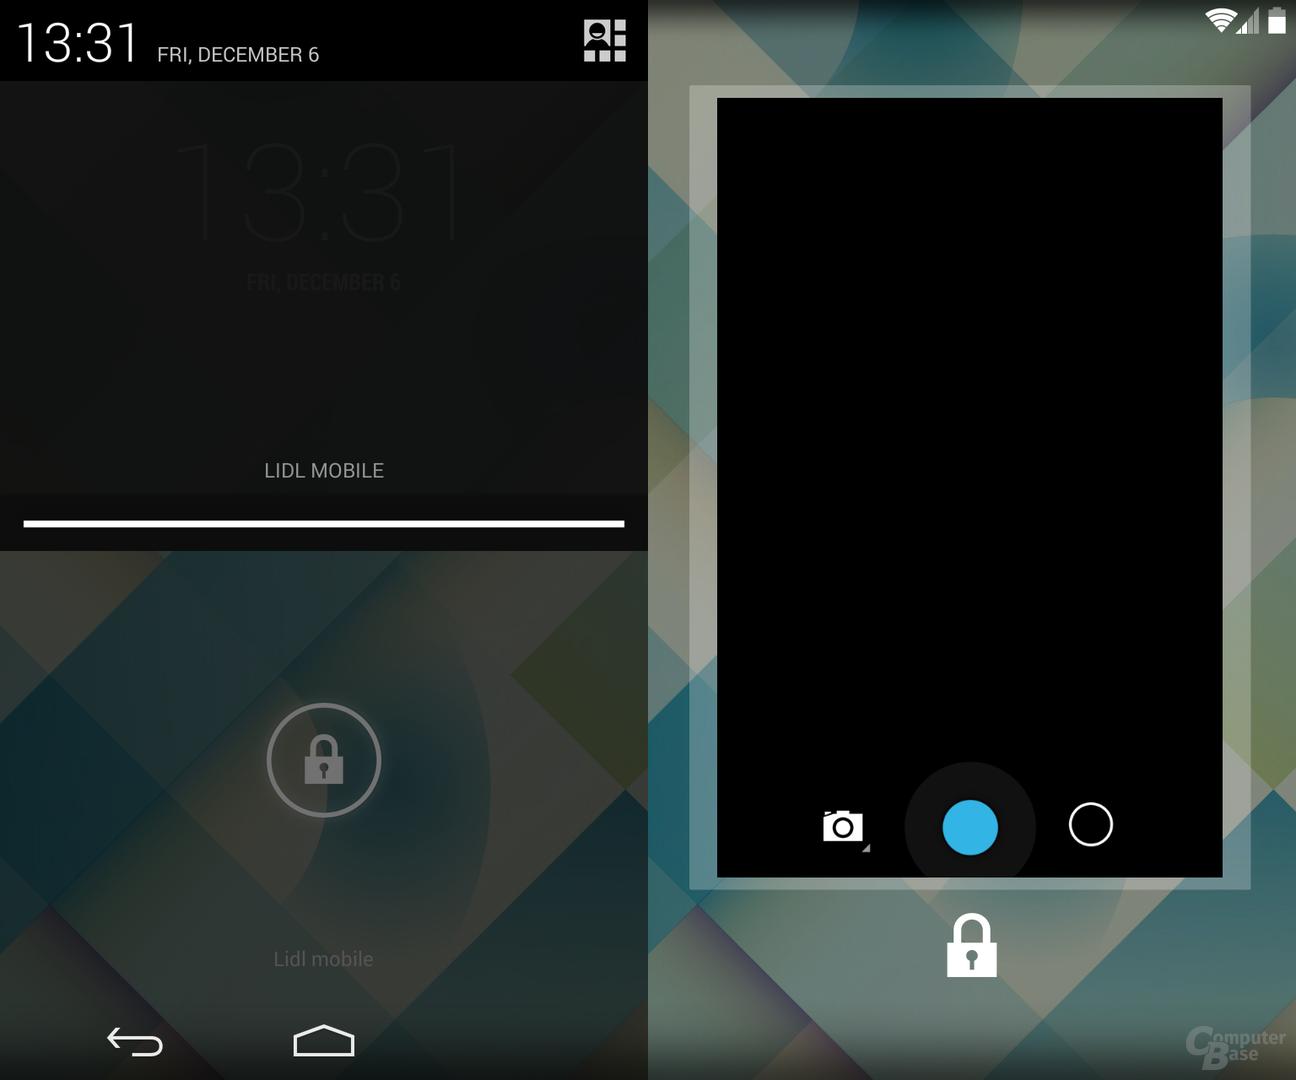 Ruckler Statusleiste Lockscreen entfernt / Kamera-Widget Größe angepasst